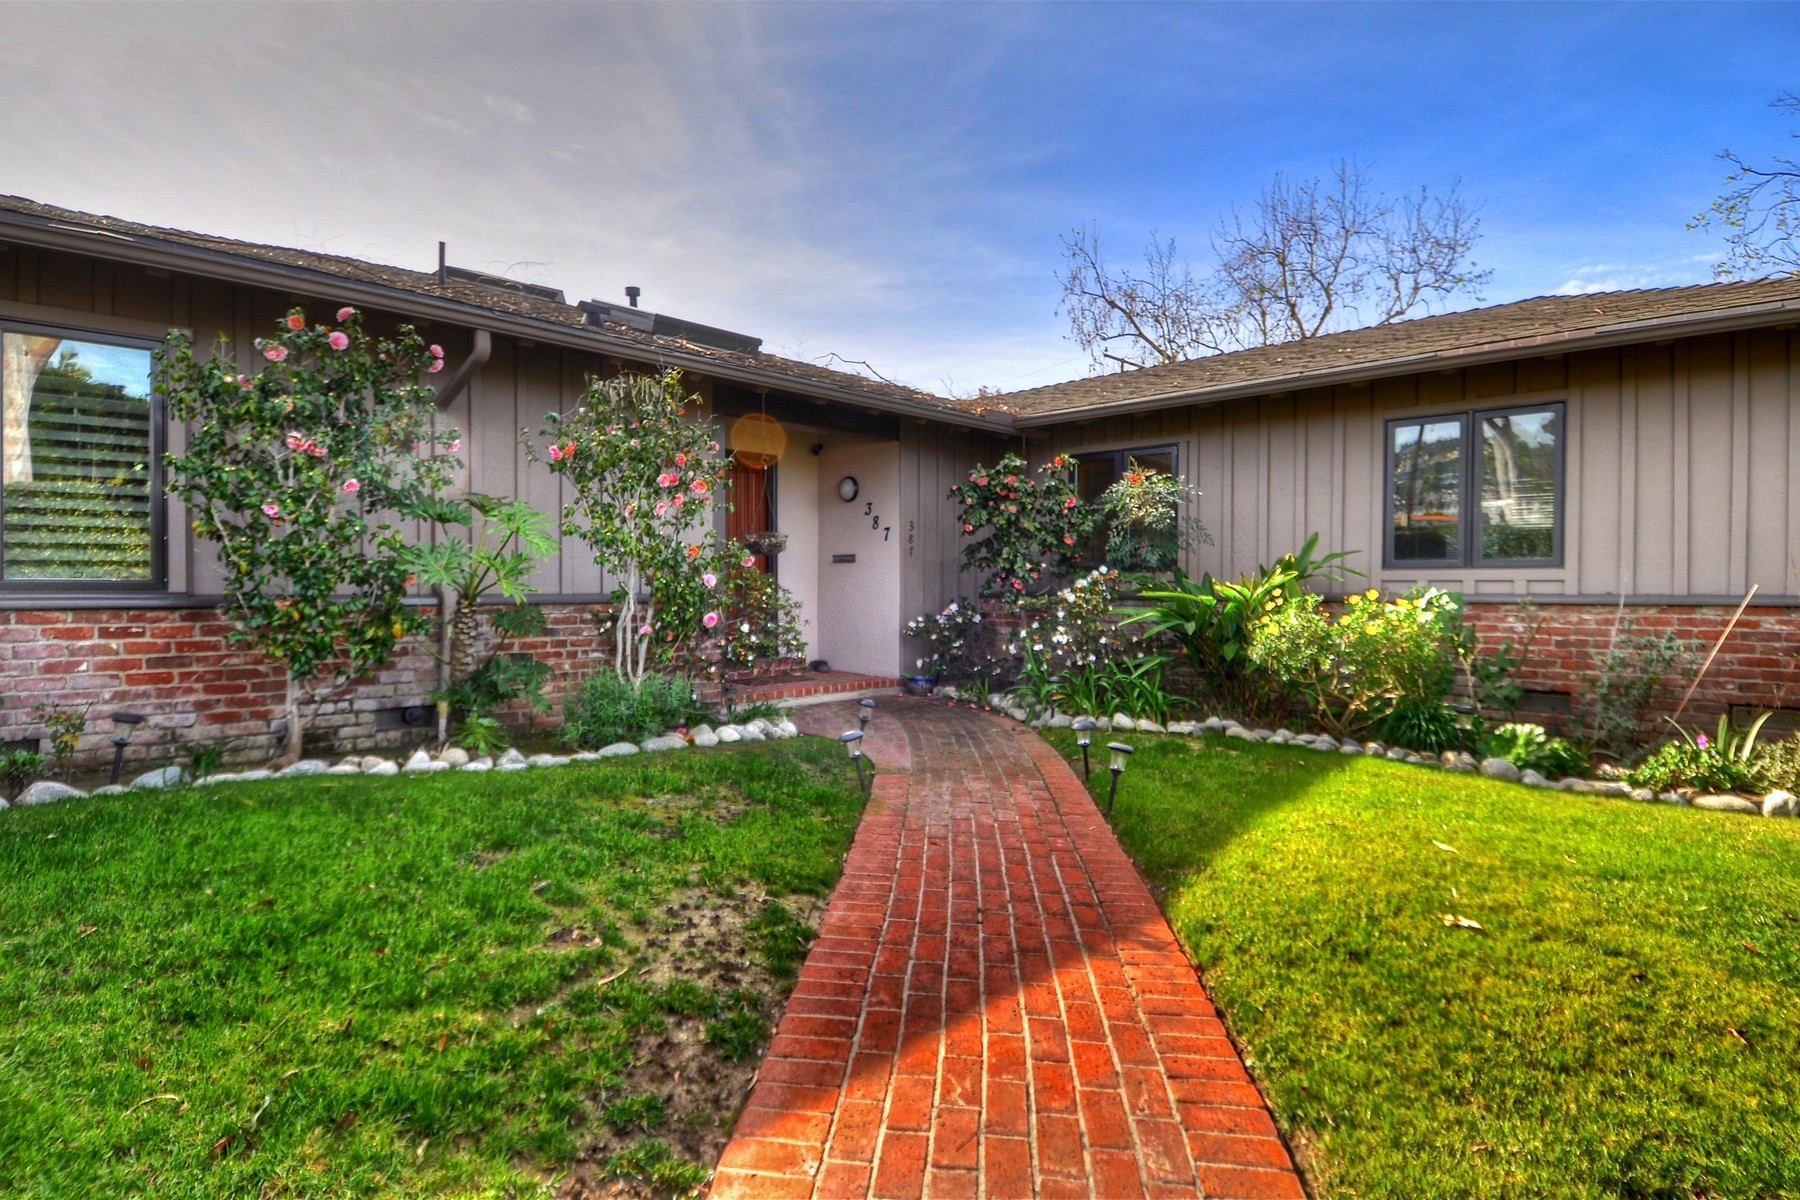 独户住宅 为 销售 在 387 El Camino Real 387 El Camino Del Mar 拉古纳, 加利福尼亚州, 92651 美国